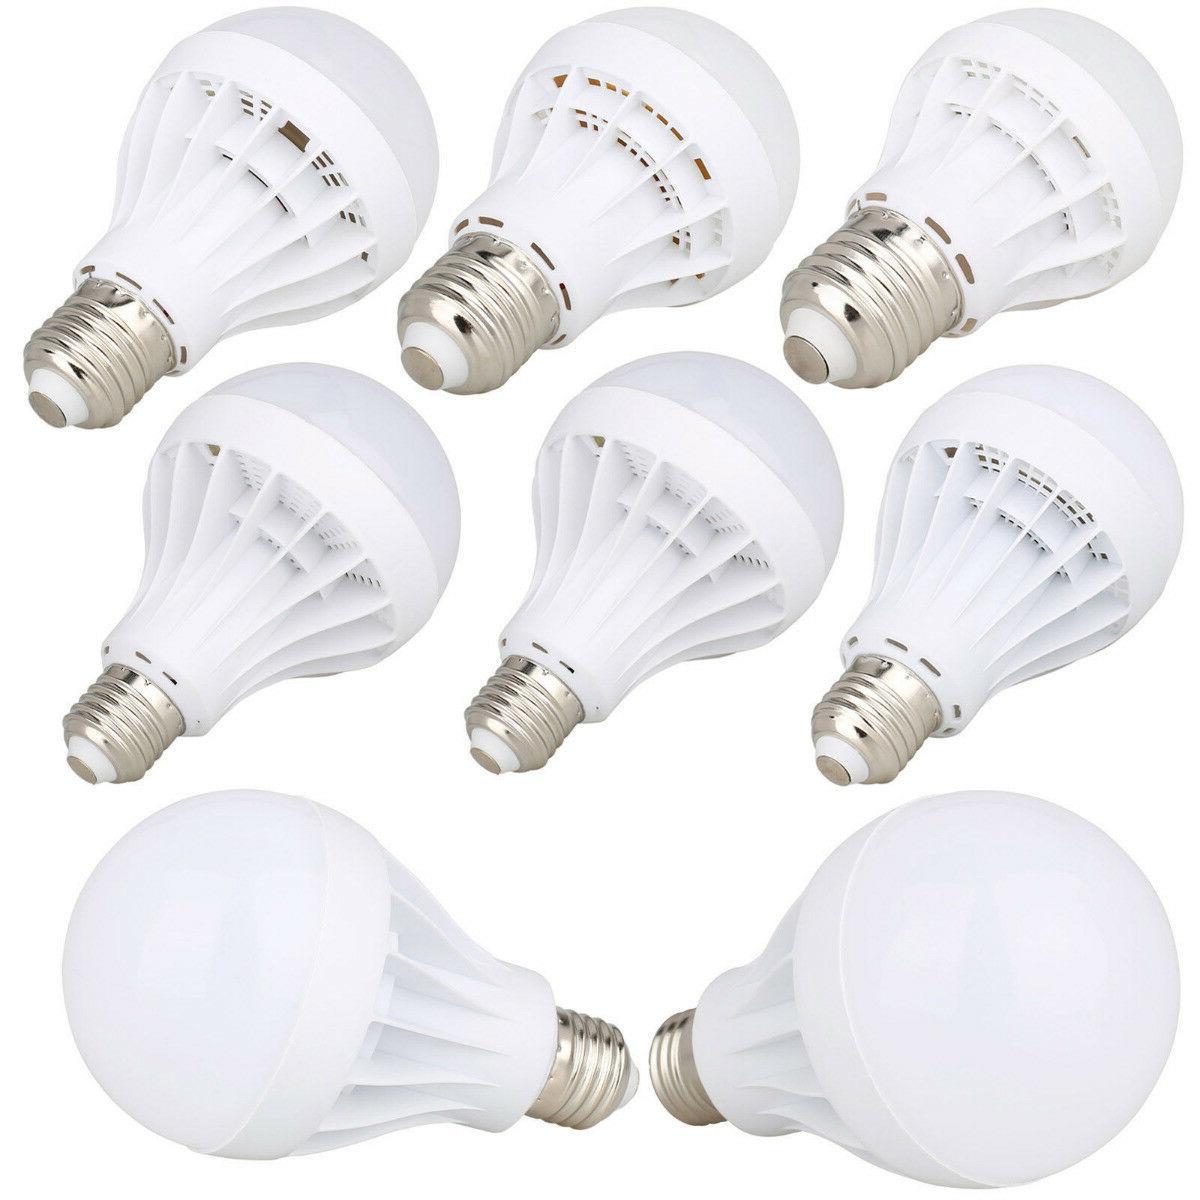 2020 led e27 energy saving bulb light